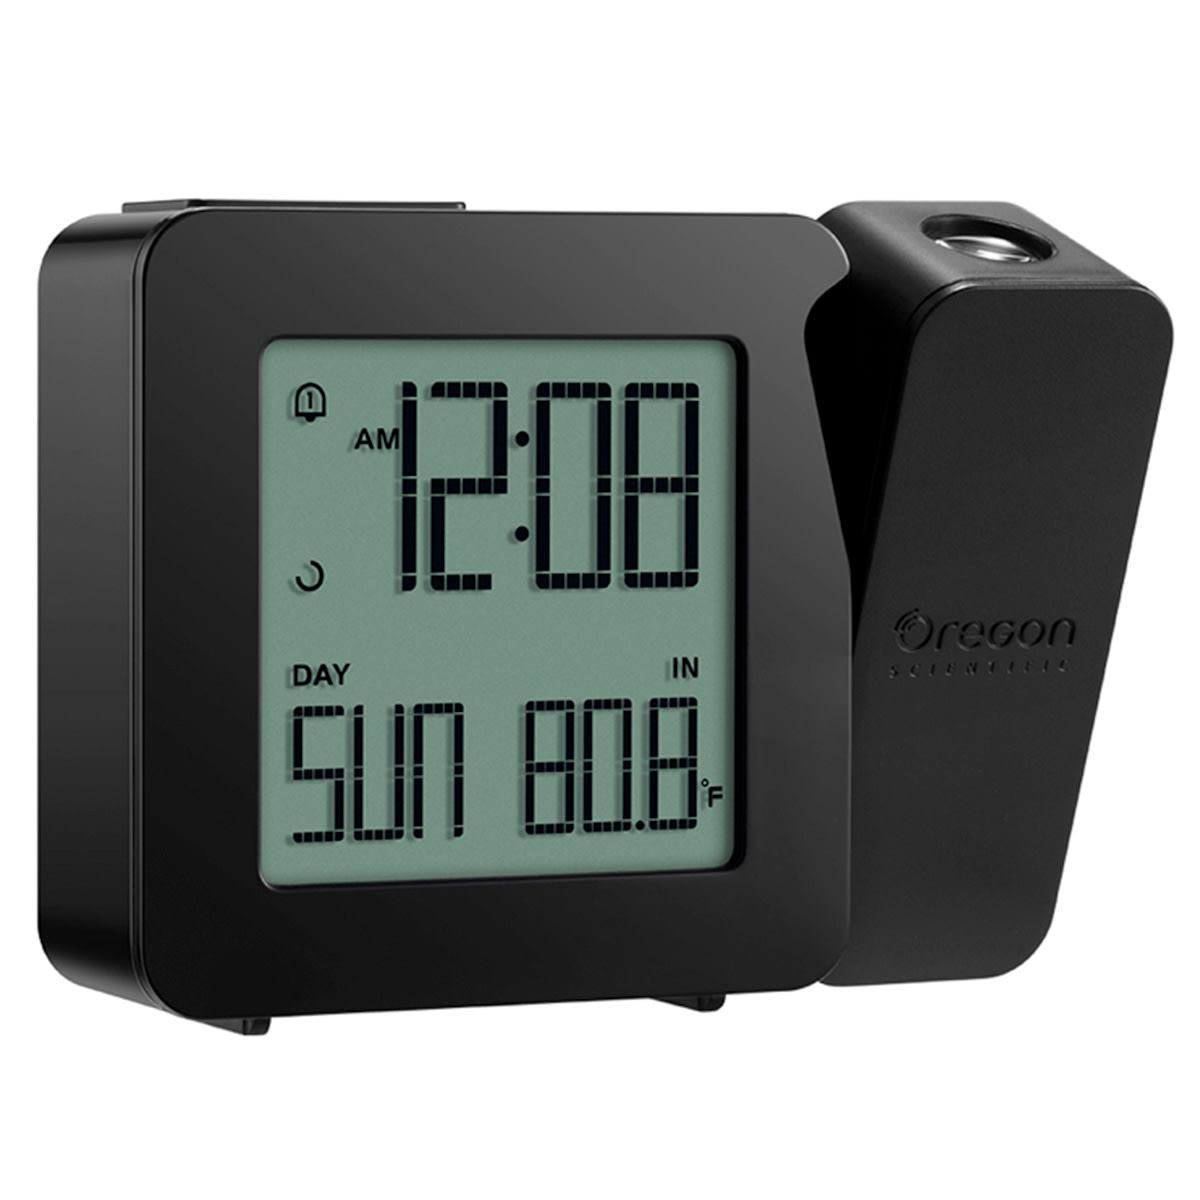 Med projektor, dag, temperatur, snooze og stigende alarm